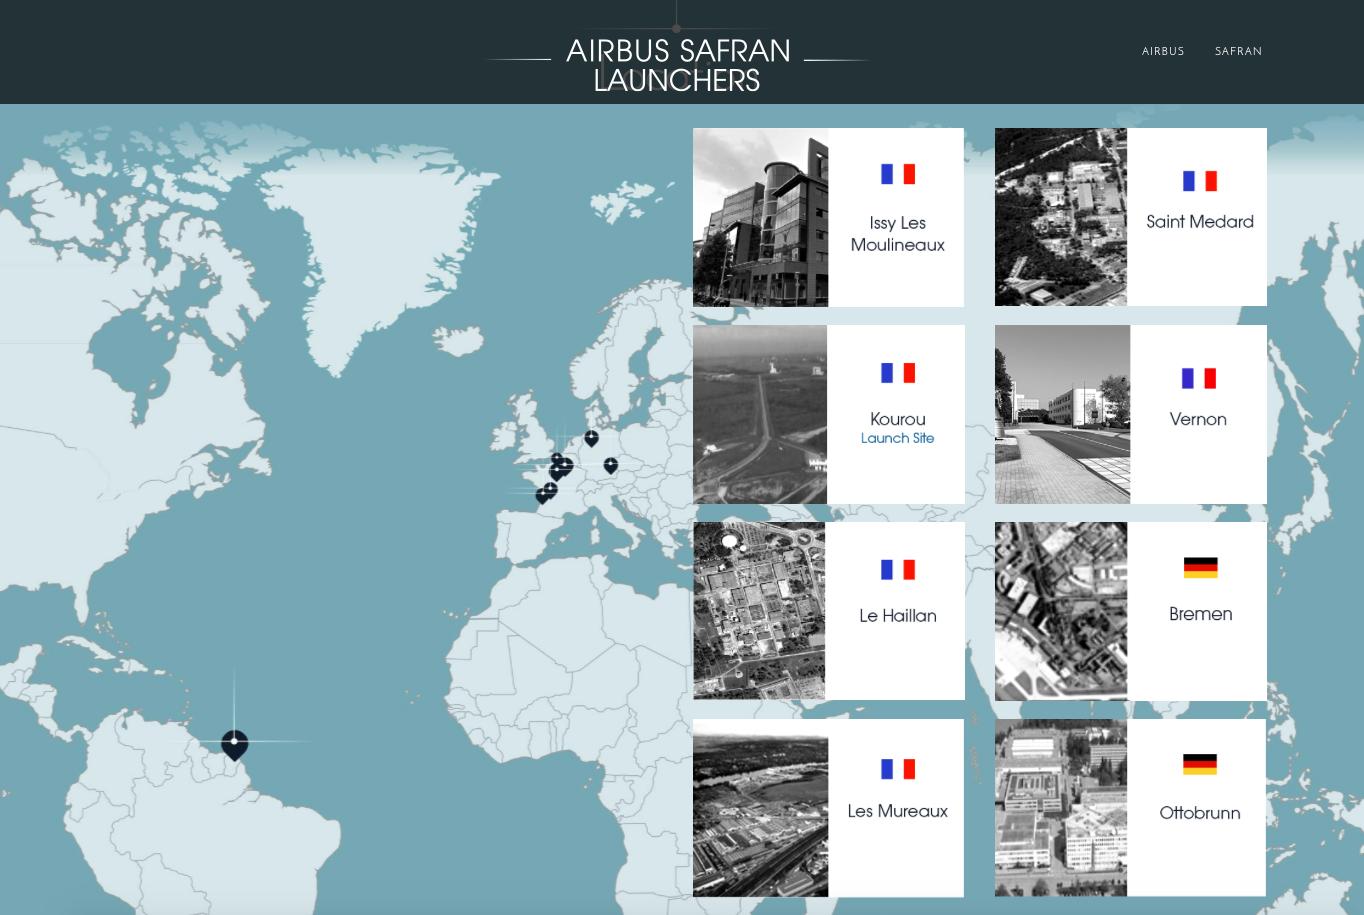 Airbus et Safran finalisent leur joint-venture Airbus Safran Launchers